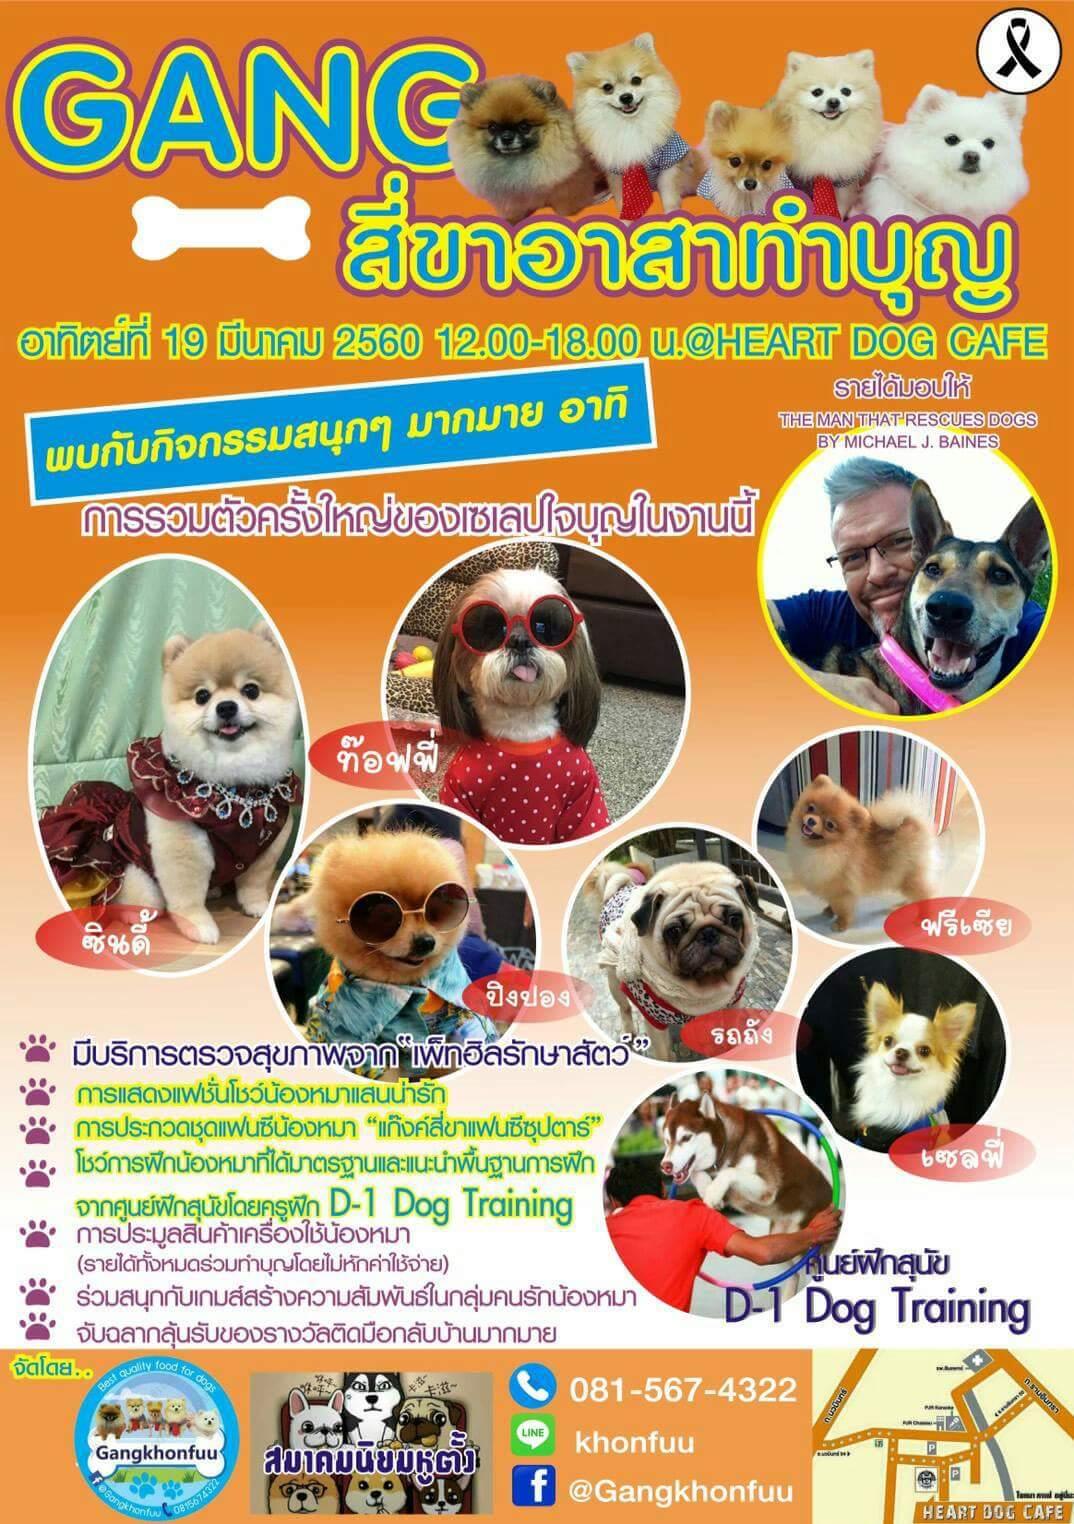 Dogilike.com :: ชวนคนรักหมาไปร่วมกิจกรรมน่ารัก Gang สี่ขาอาสาทำบุญ